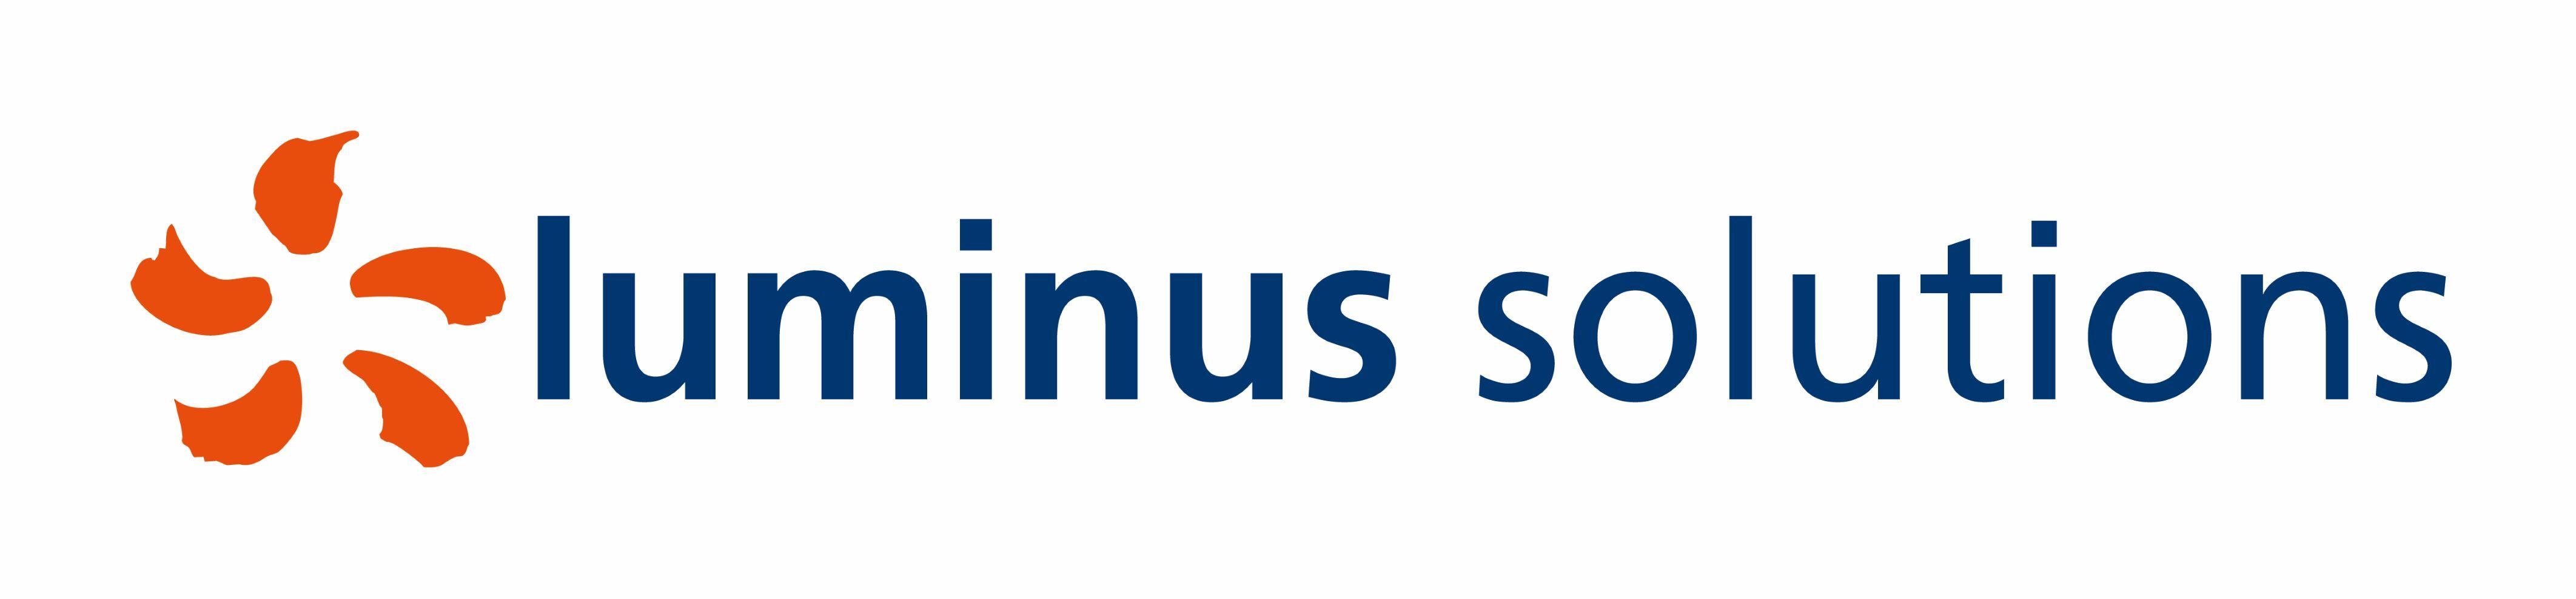 logo Luminus Solutions / Vanparijs Engineers